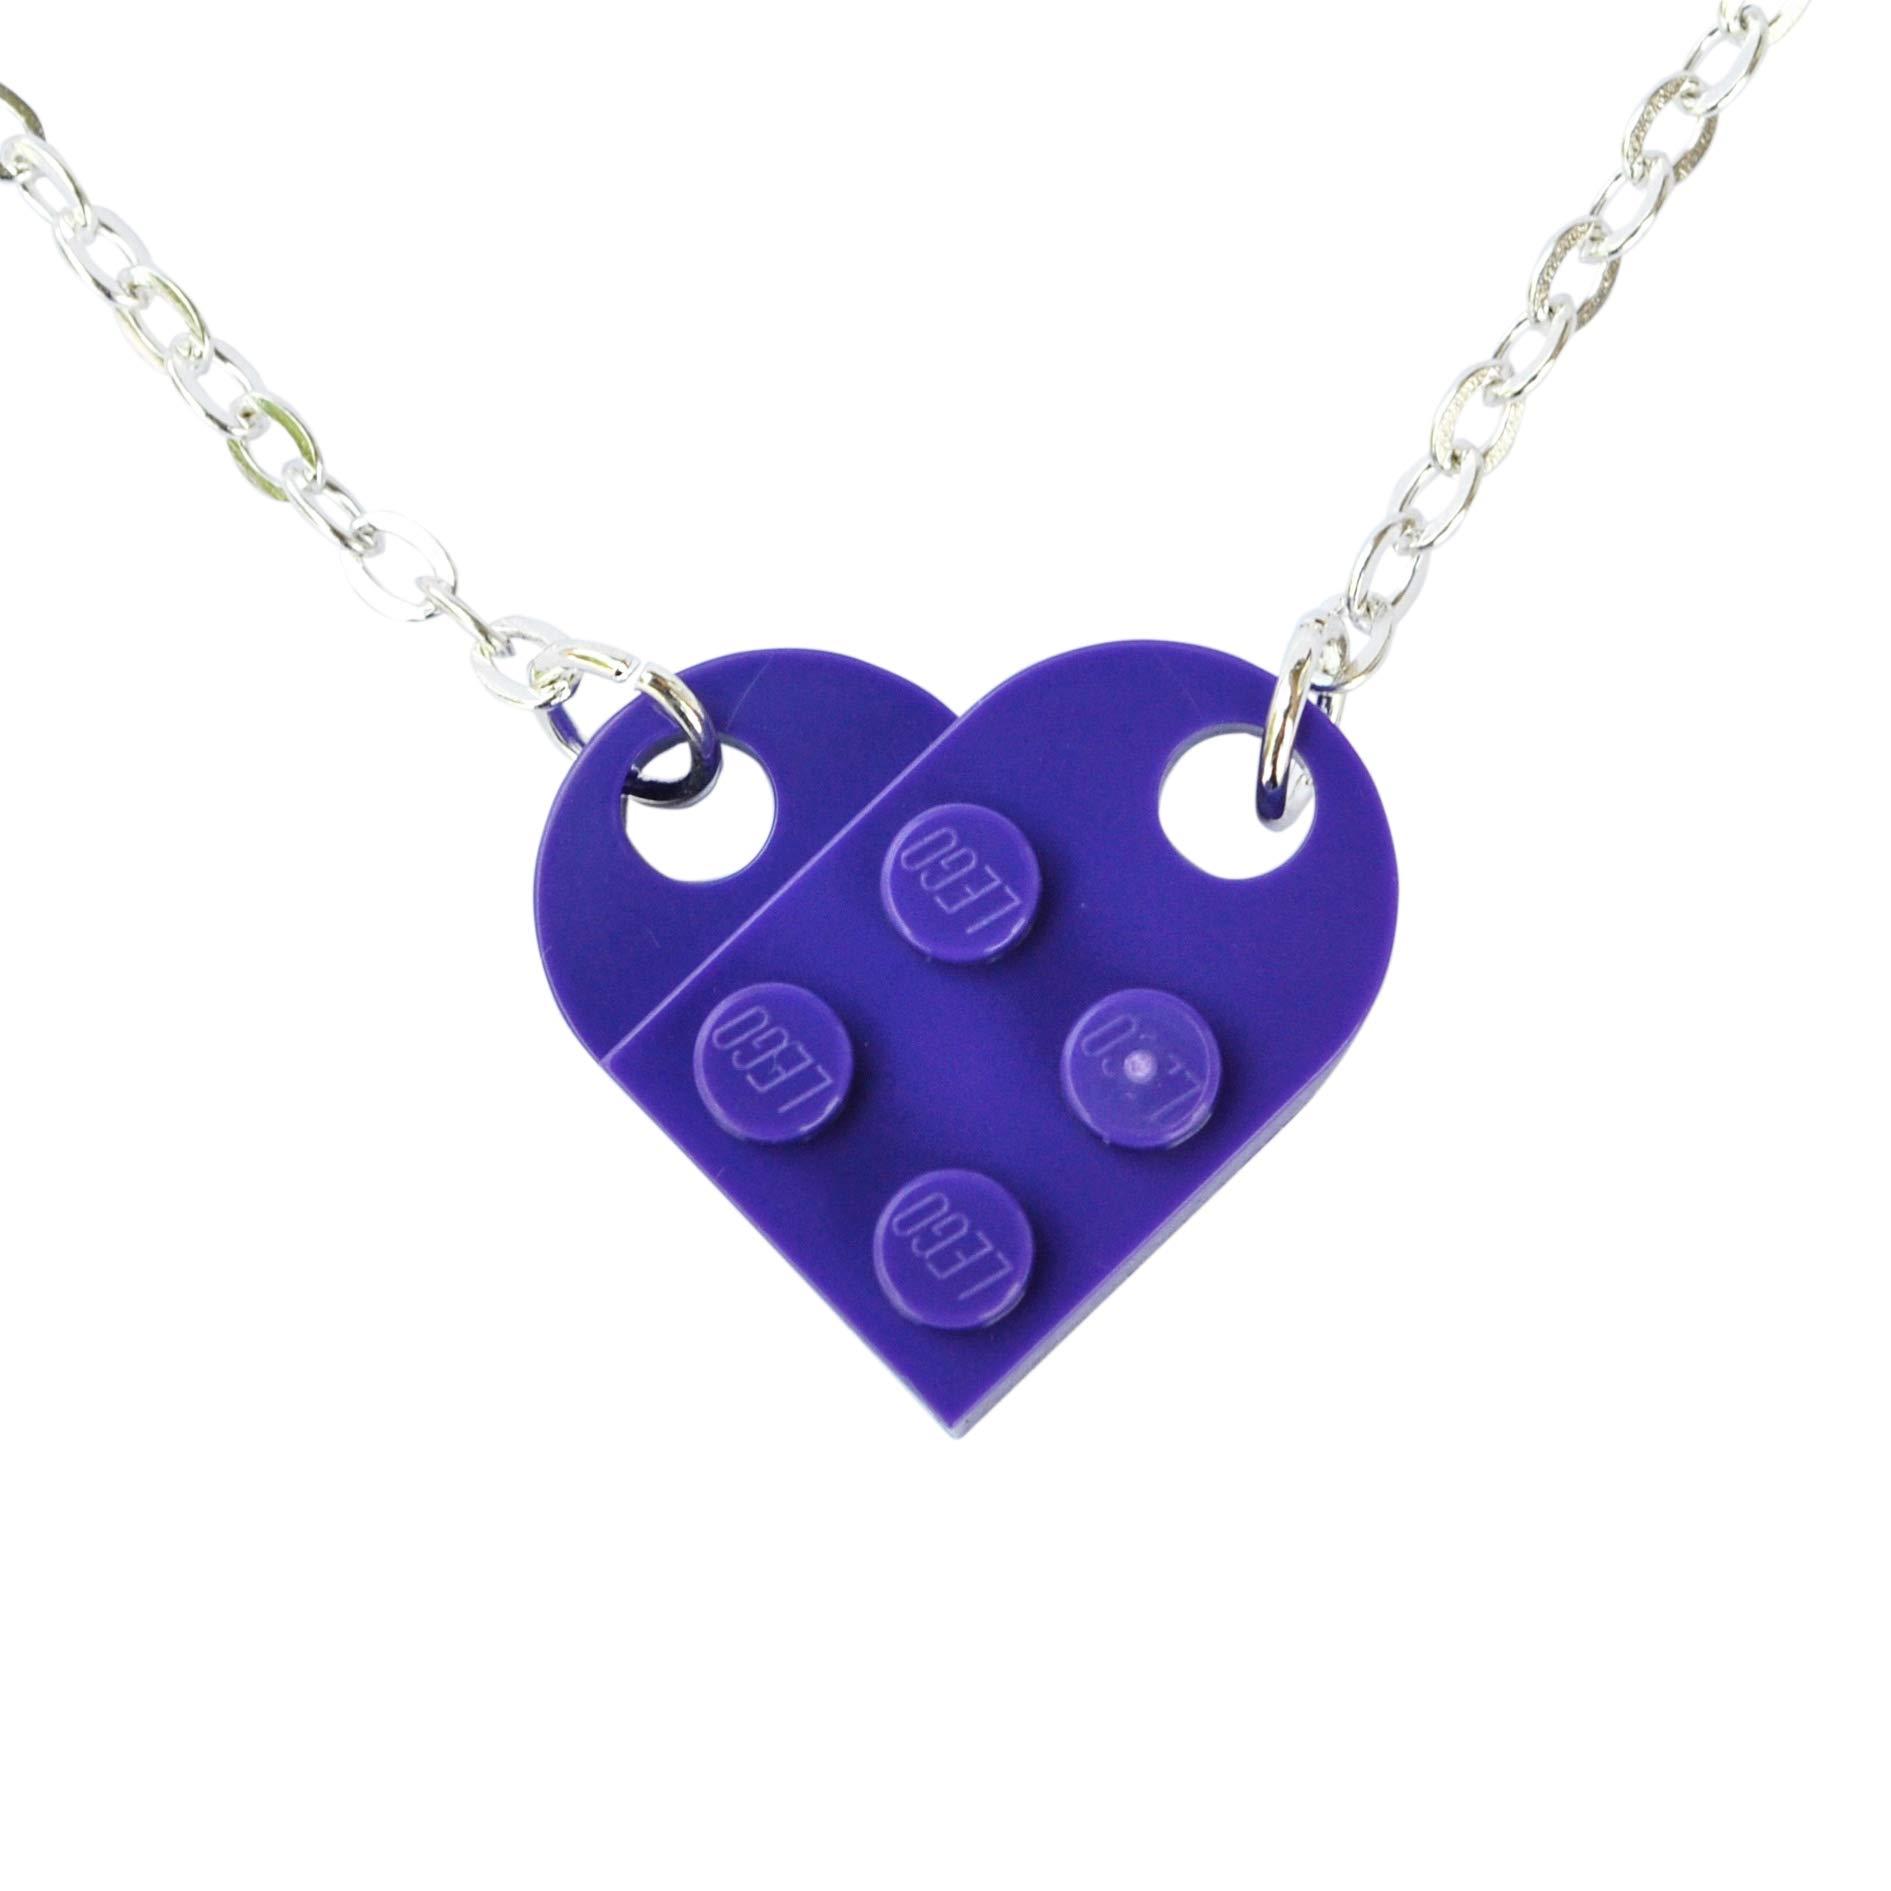 Love Heart Necklace Handmade from Lego® Plates (Purple) Wedding, Girlfriend, Valentines, Birthday, Ladies Jewellery Gift